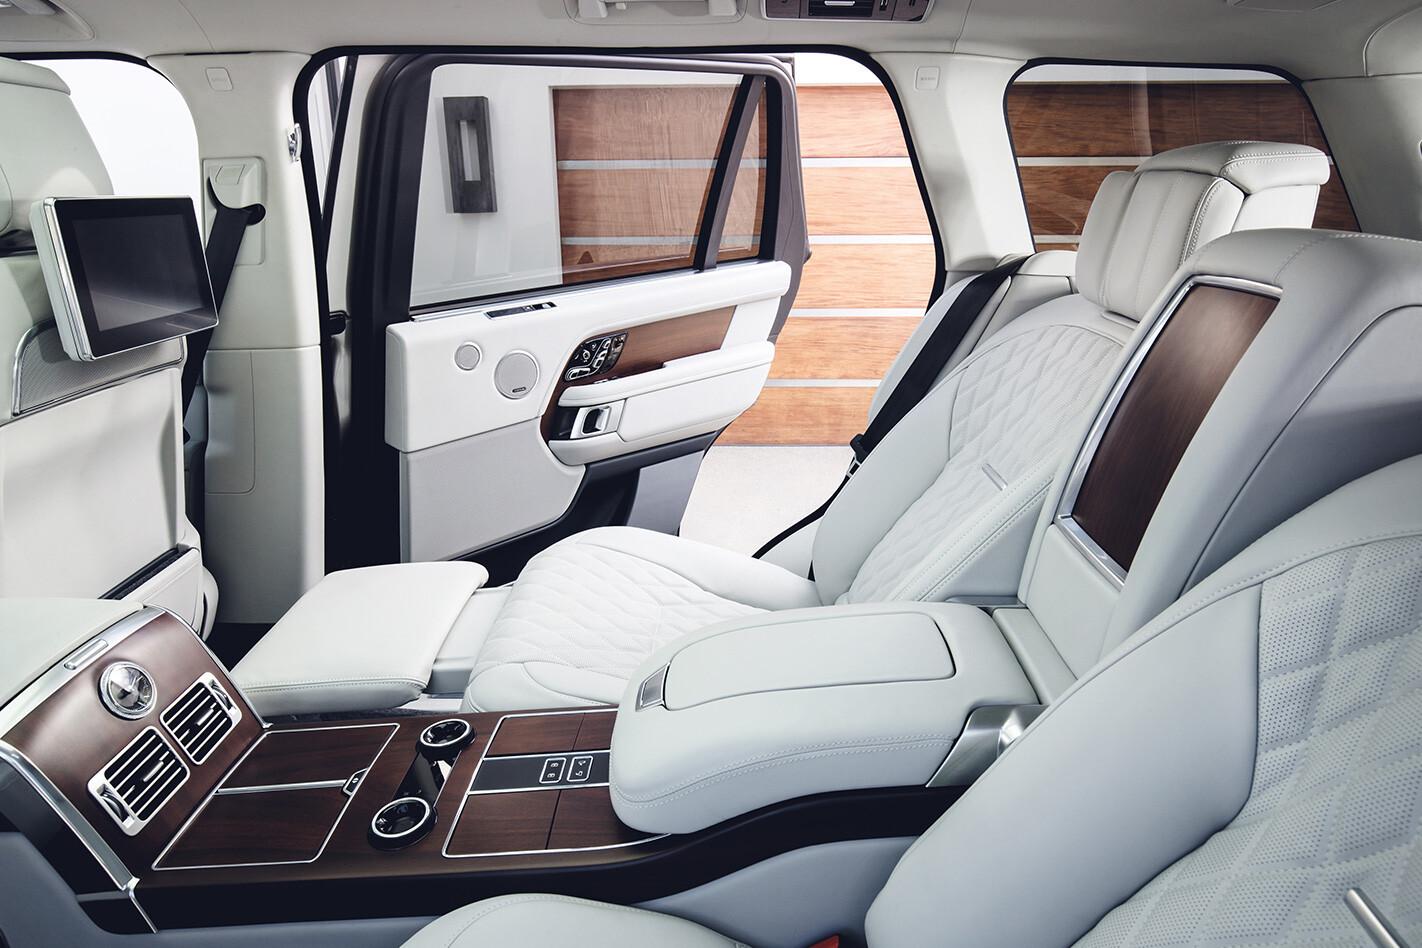 2018-Range-Rover-SV-Autobiography-rear-seats.jpg